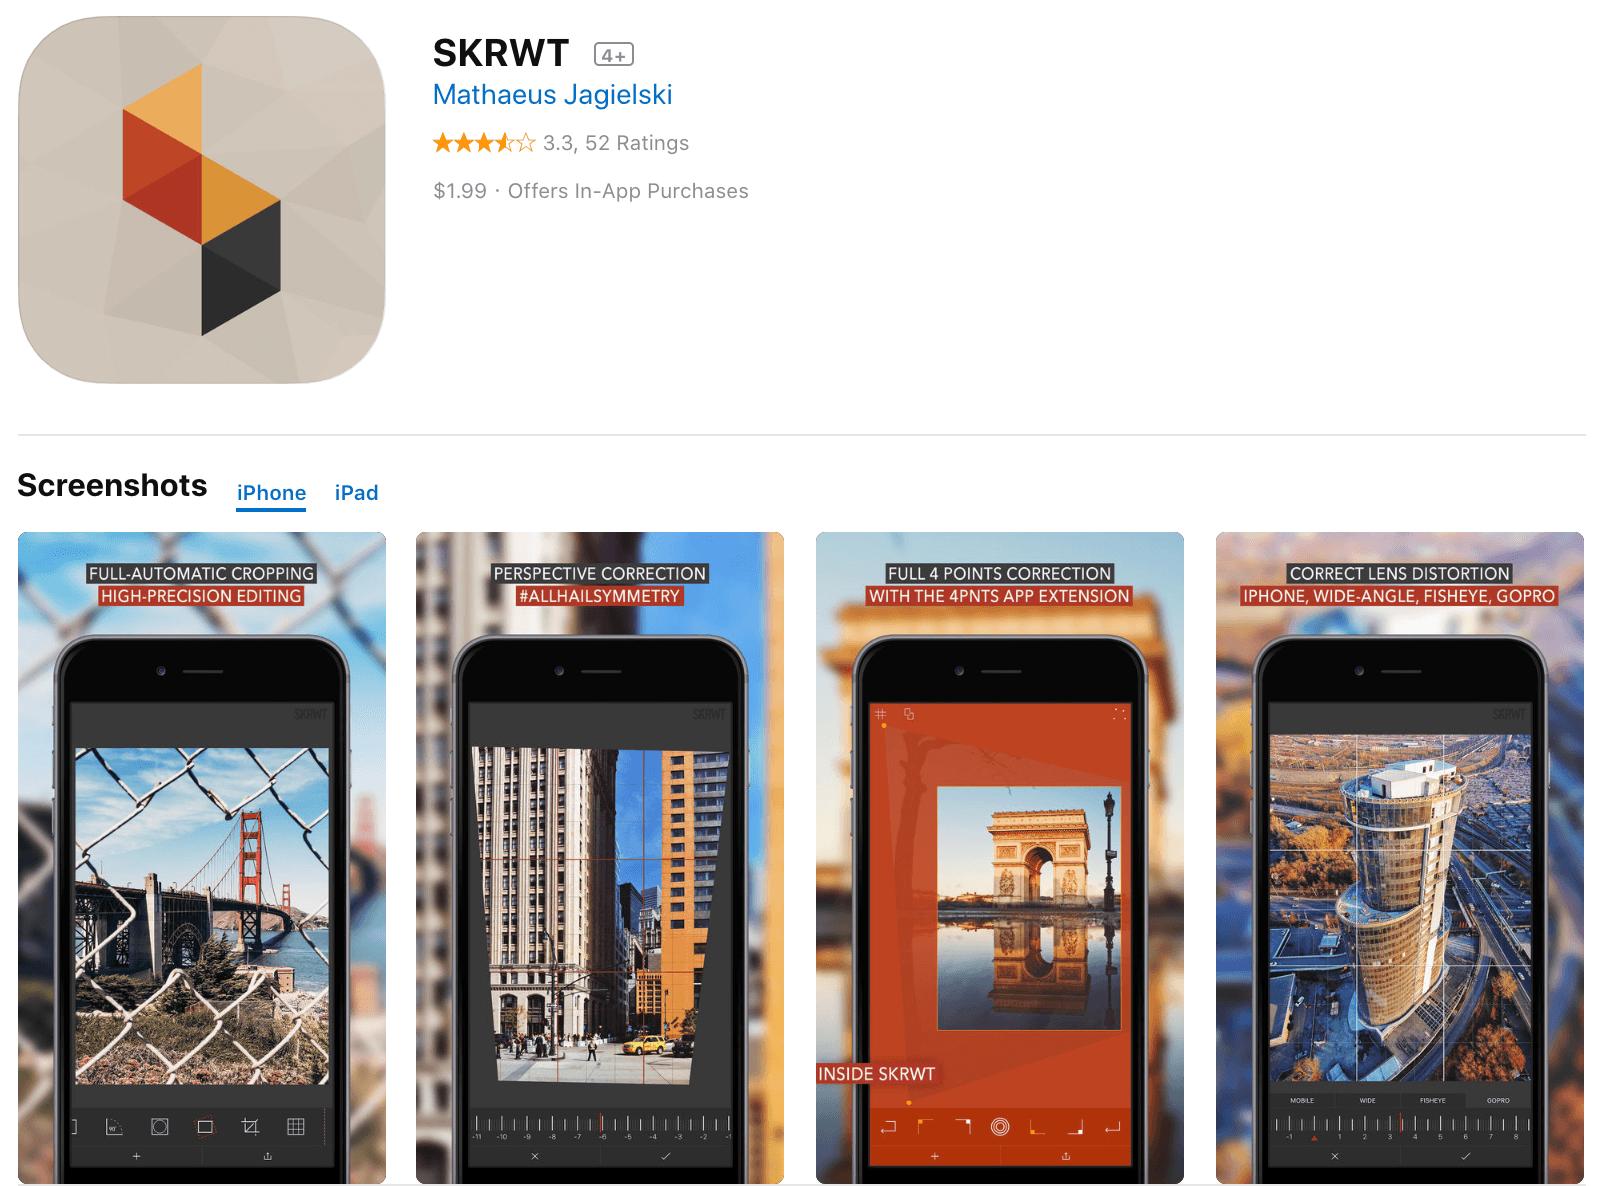 SKRWT Picture Editing App